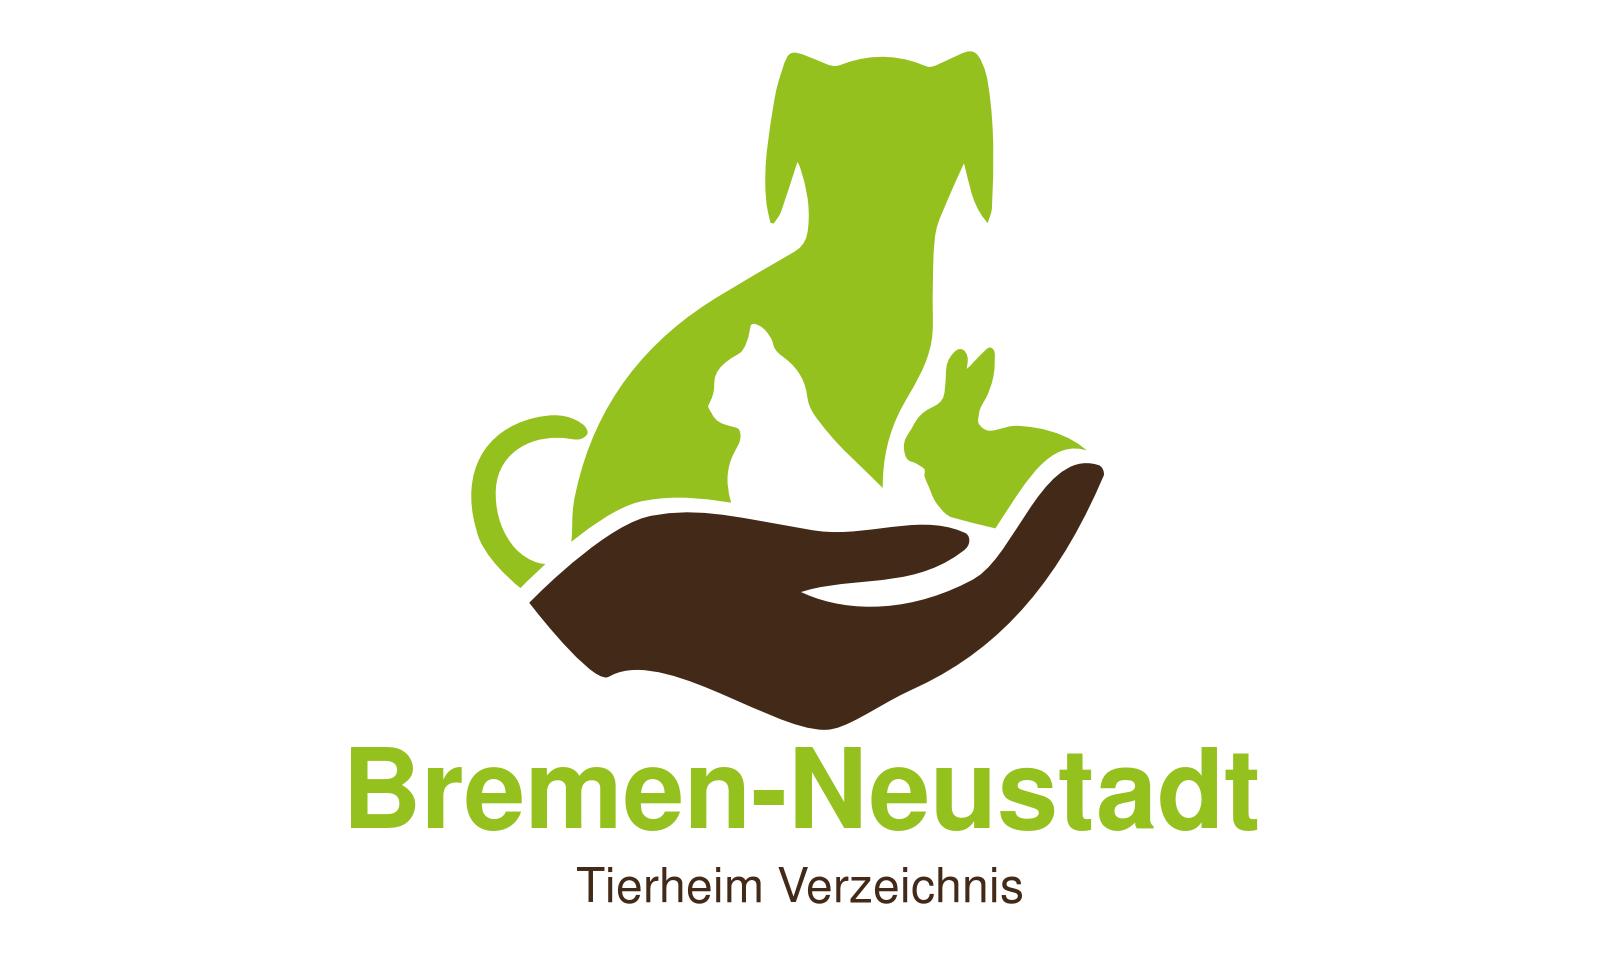 Tierheim Bremen Neustadt